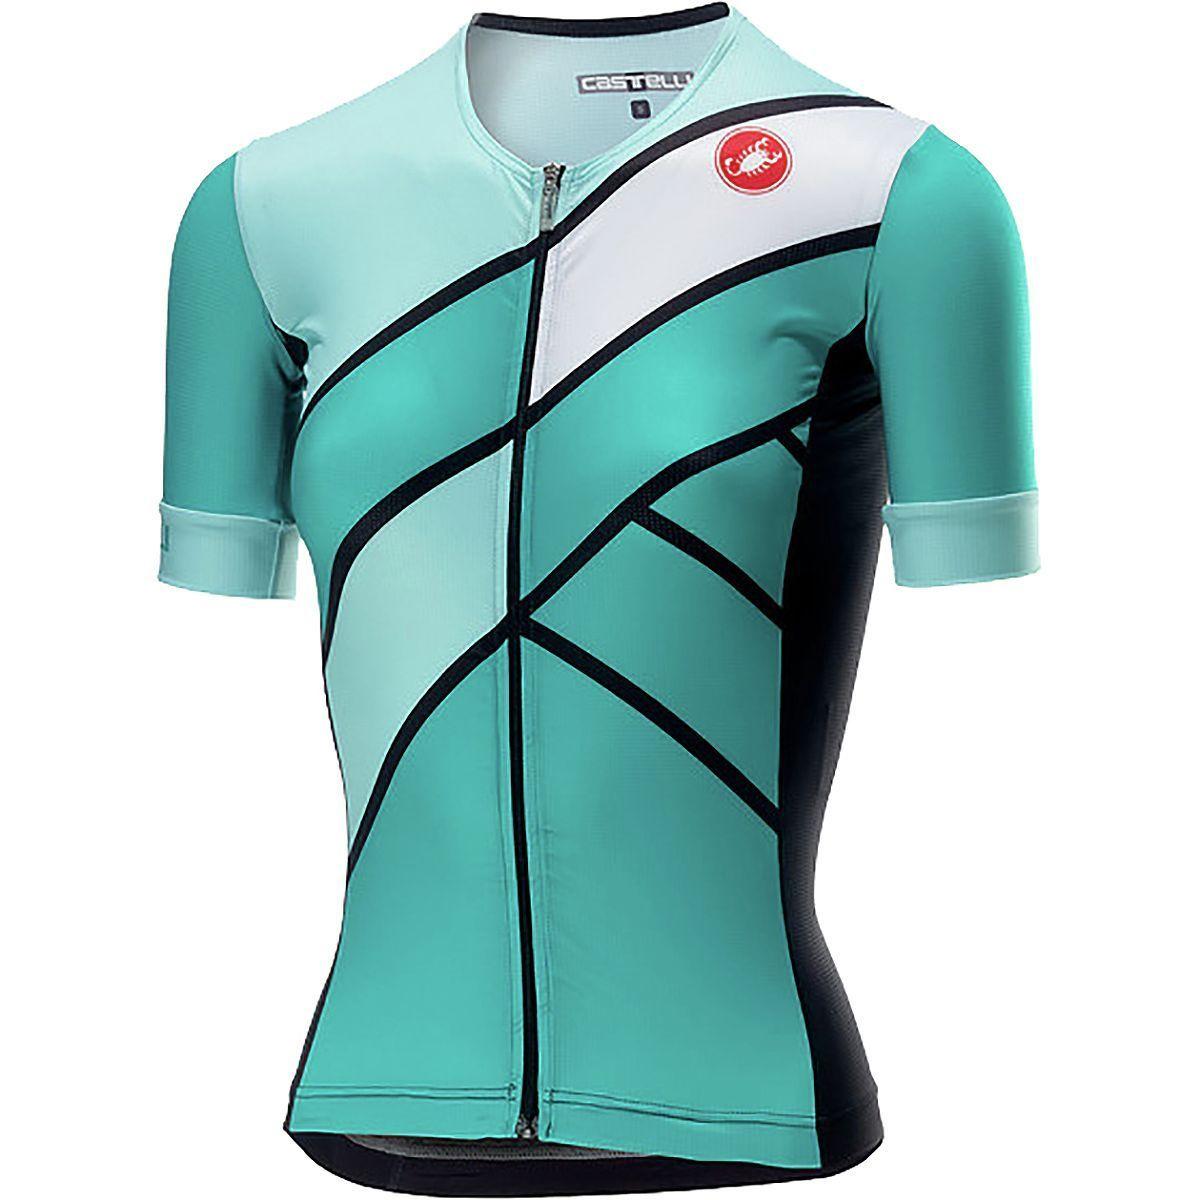 Castelli designed the Women's Free Speed Race Jersey to